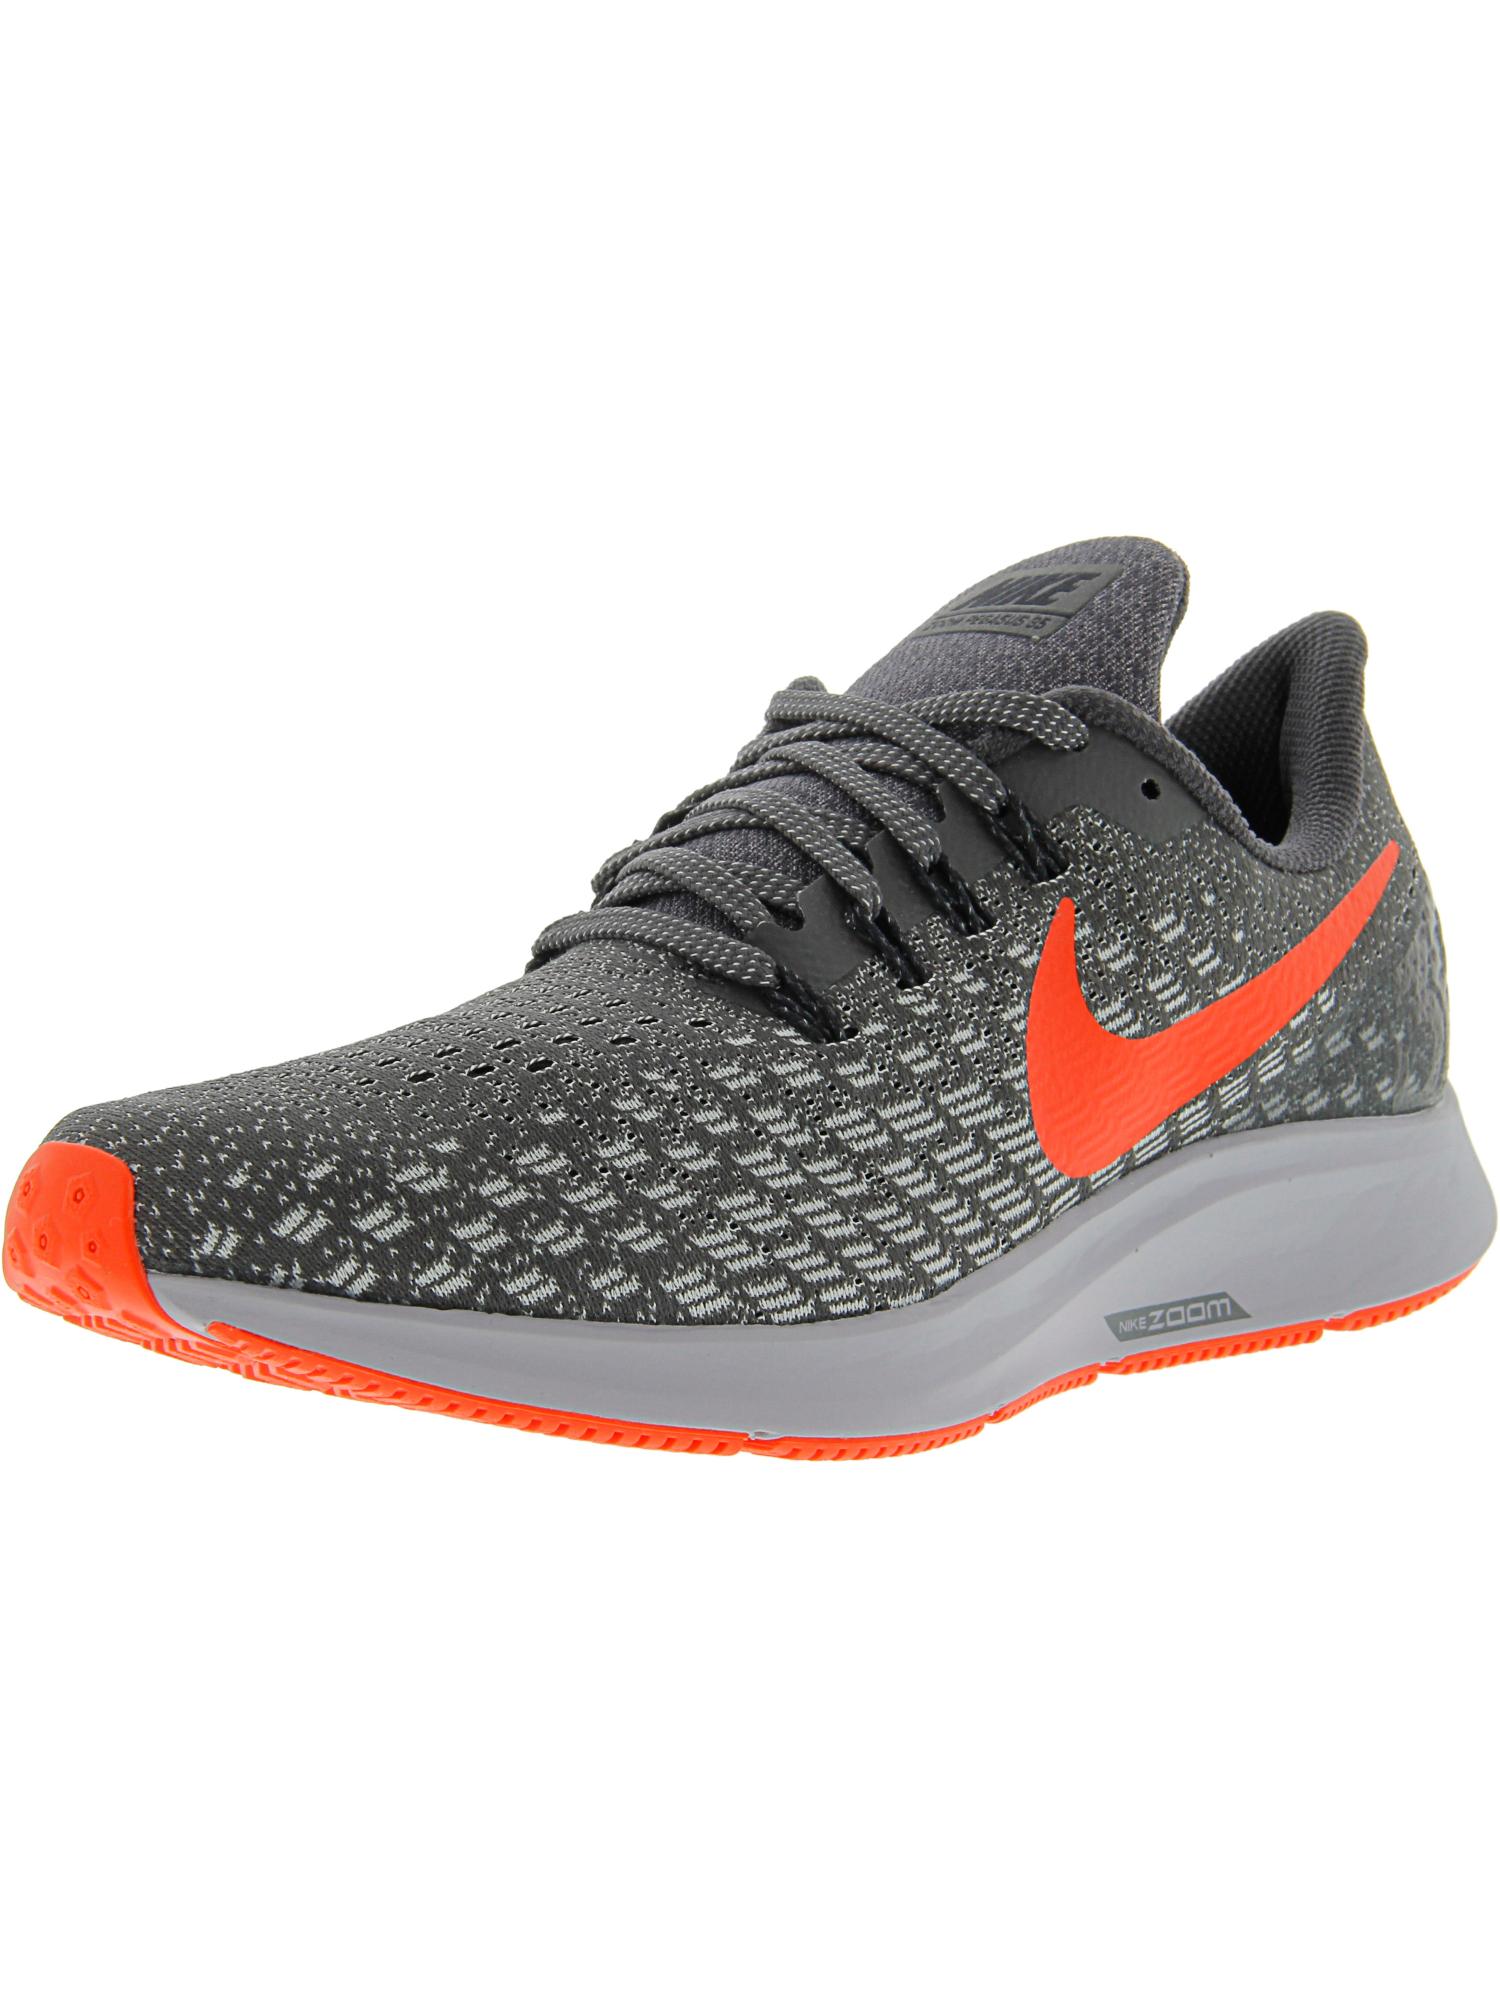 134f518daac7 Nike Men s Air Zoom Pegasus 35 Ankle-High Mesh Running Shoe